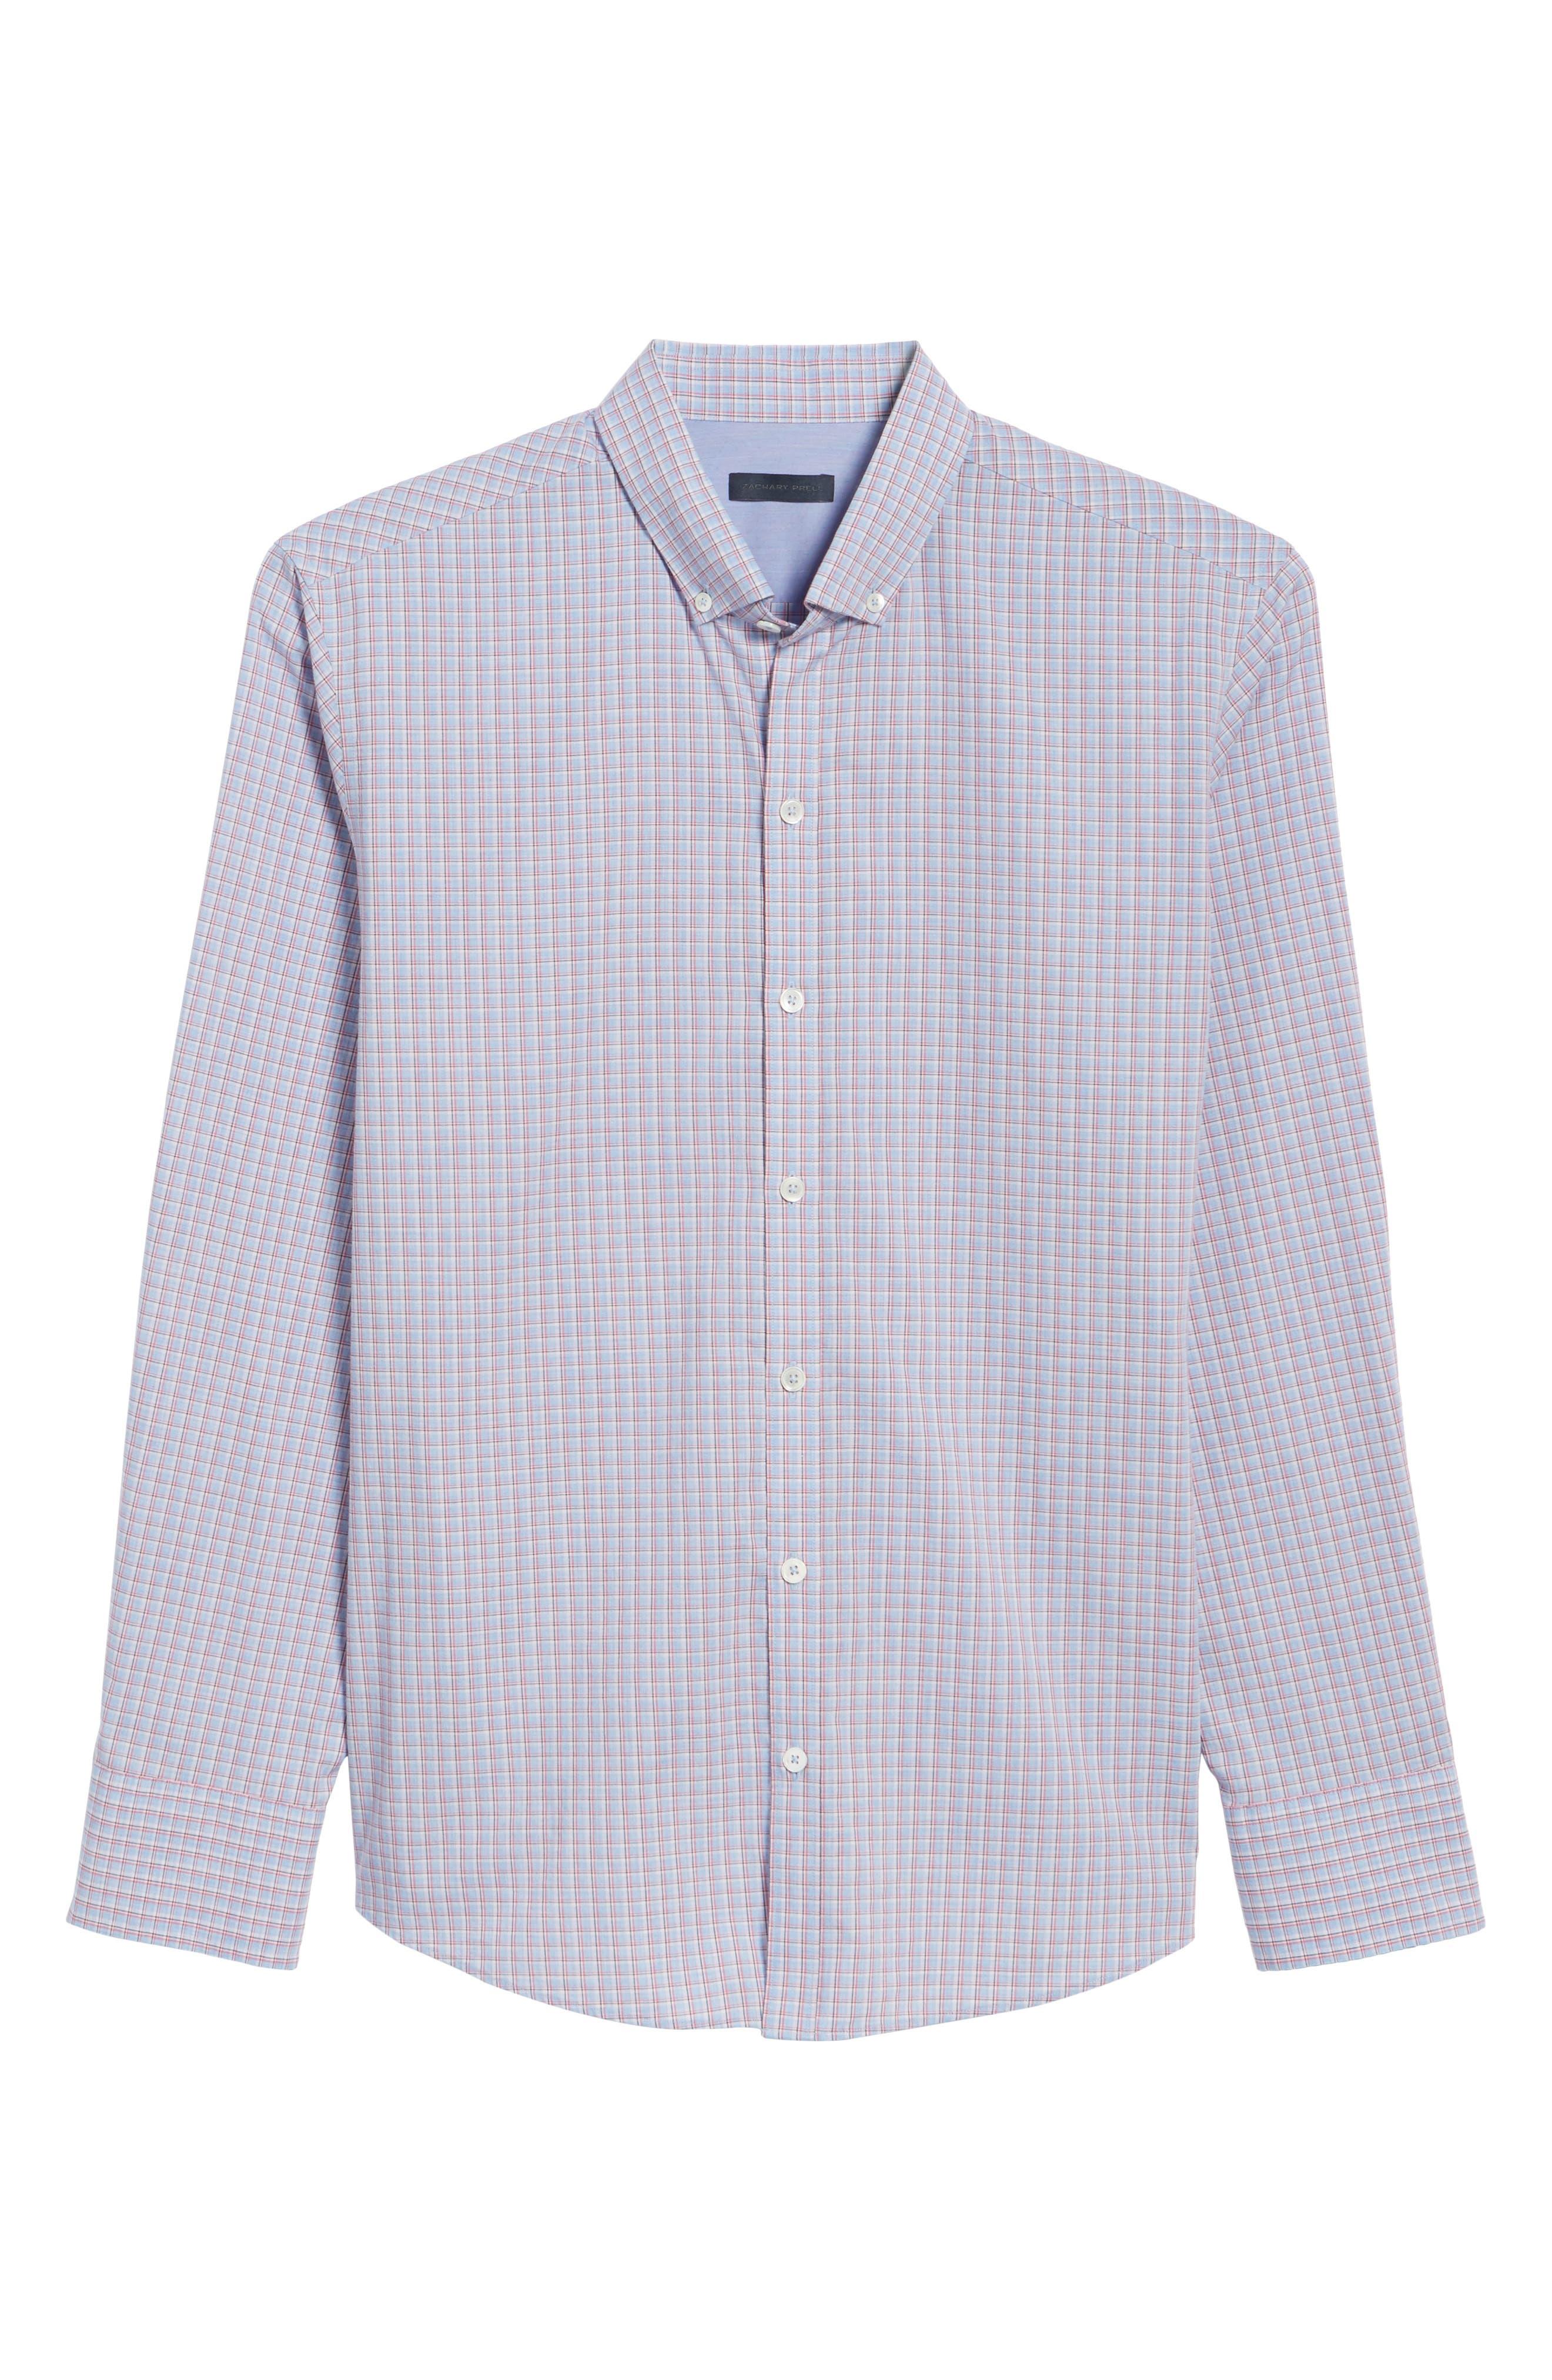 ZACHARY PRELL, Drozdov Regular Fit Plaid Sport Shirt, Alternate thumbnail 6, color, PINK